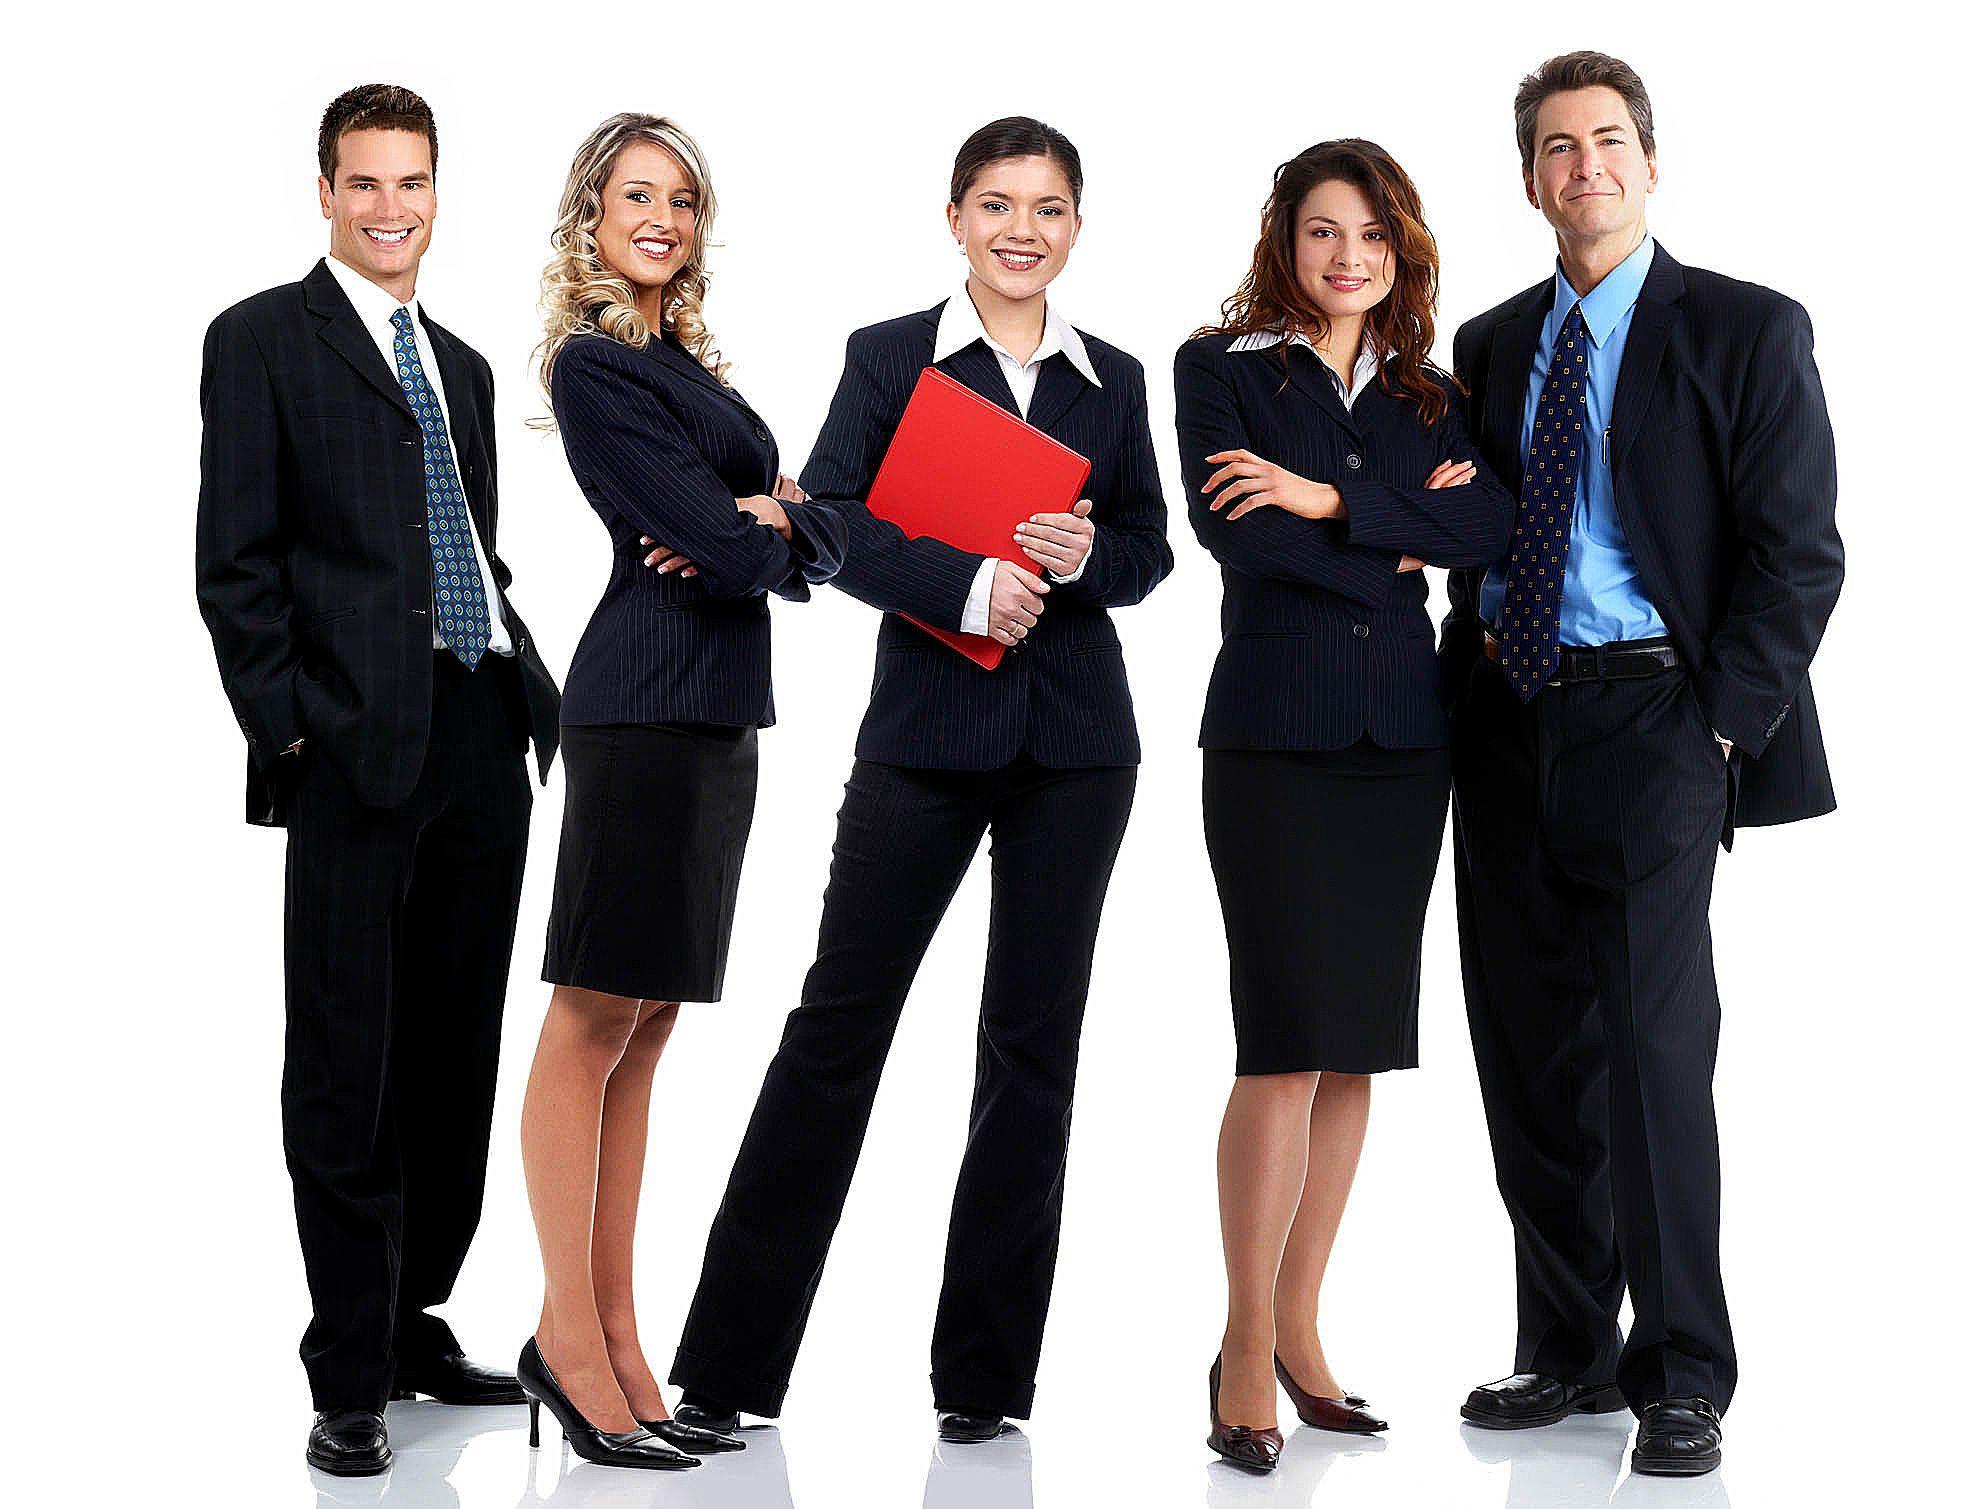 grupp snygga chefer